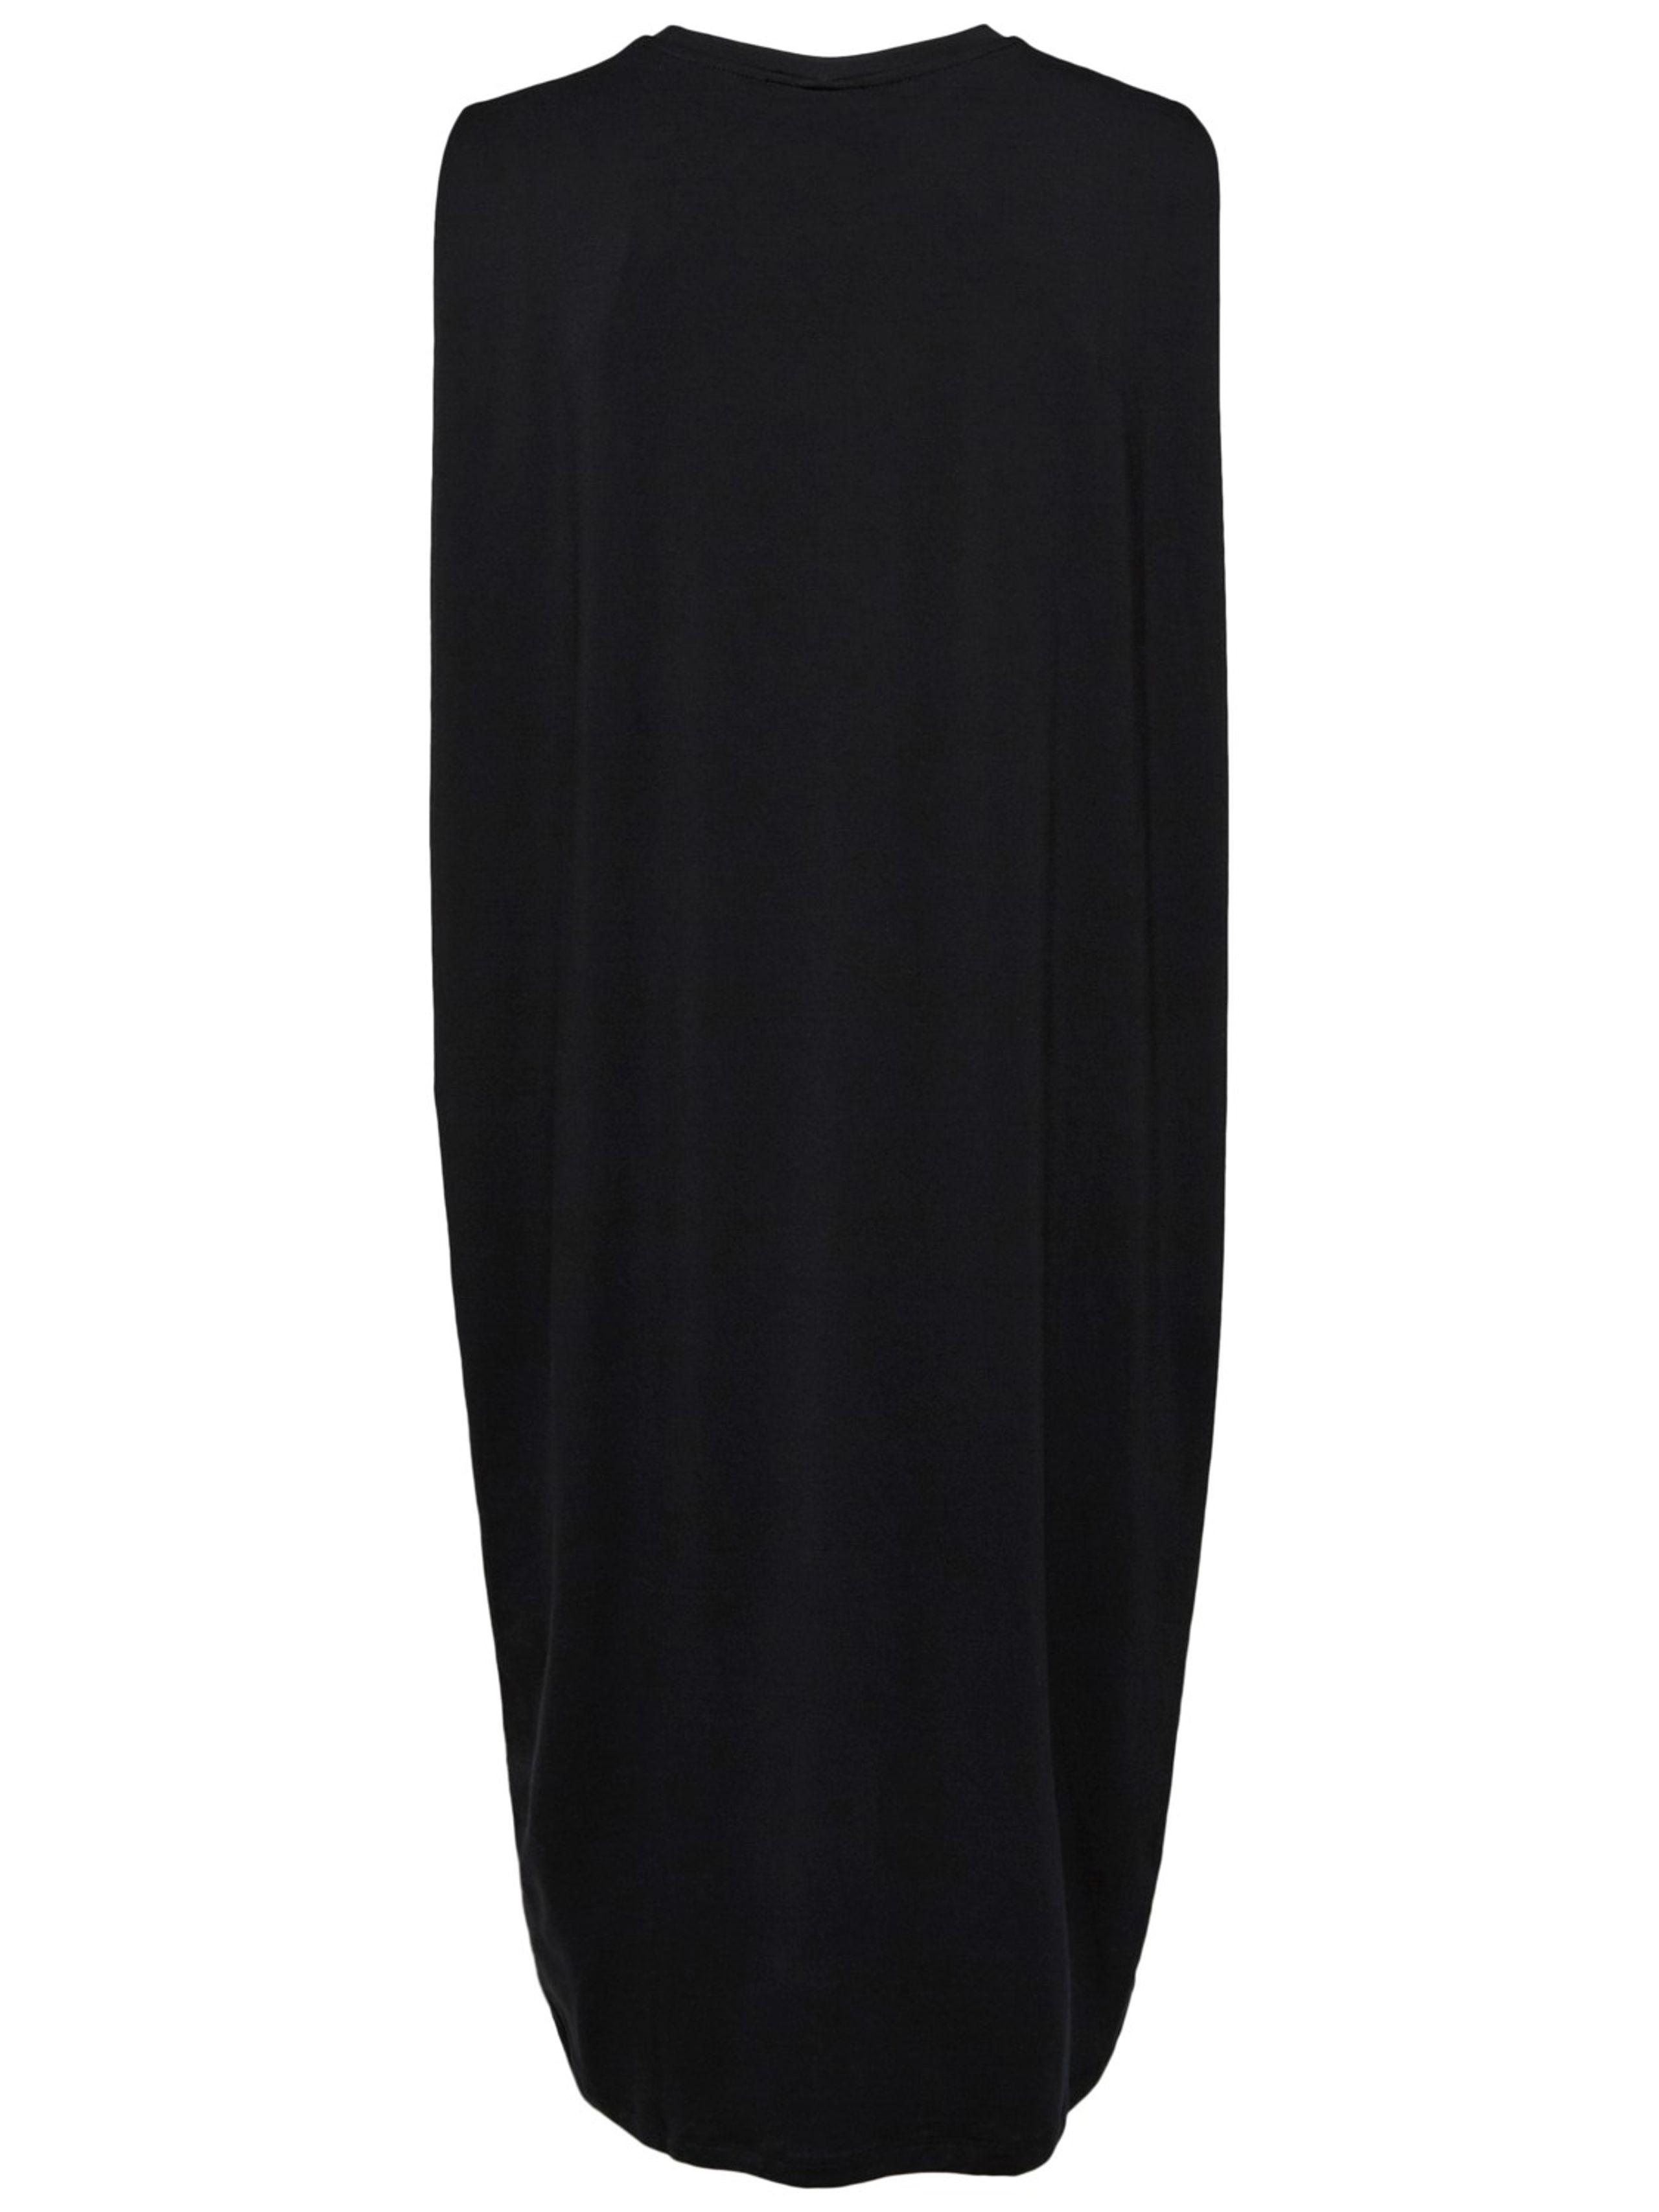 00f4d97fcb3 ... Selected Femme - Dress - Asha Midi Dress - Black ...